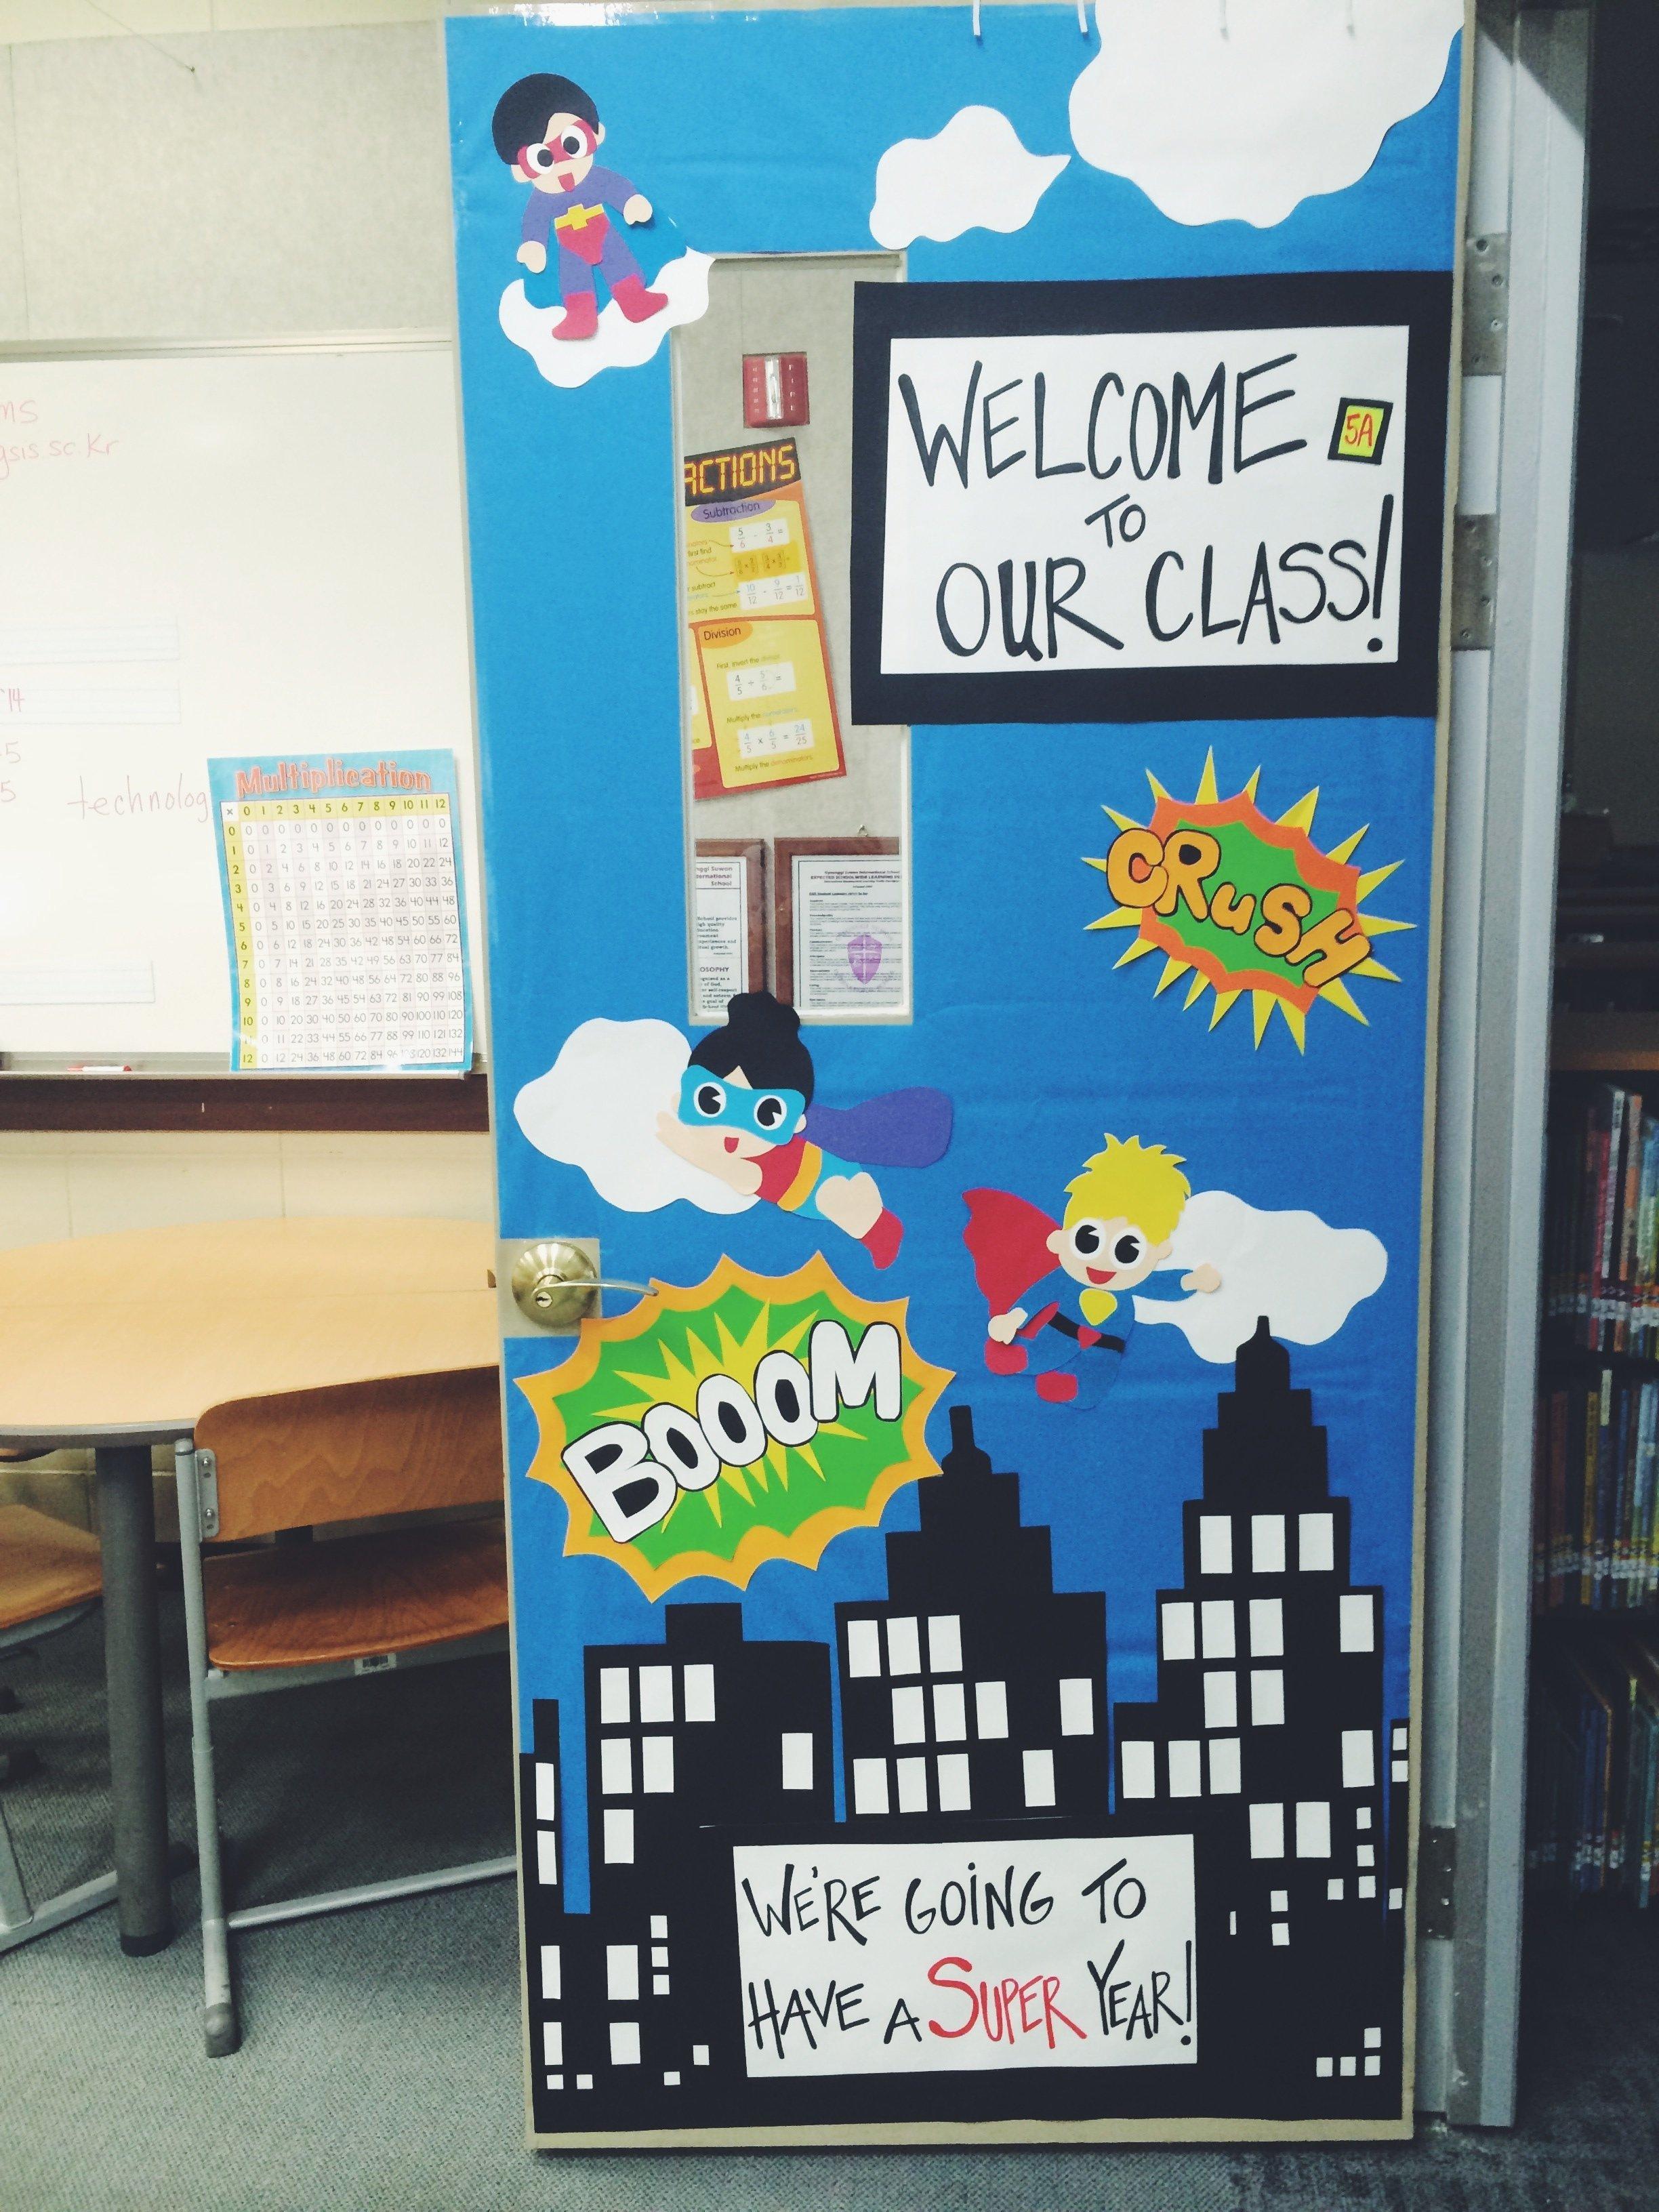 10 Beautiful Back To School Decoration Ideas ides de welcome back to school decorations galerie dimages 1 2021